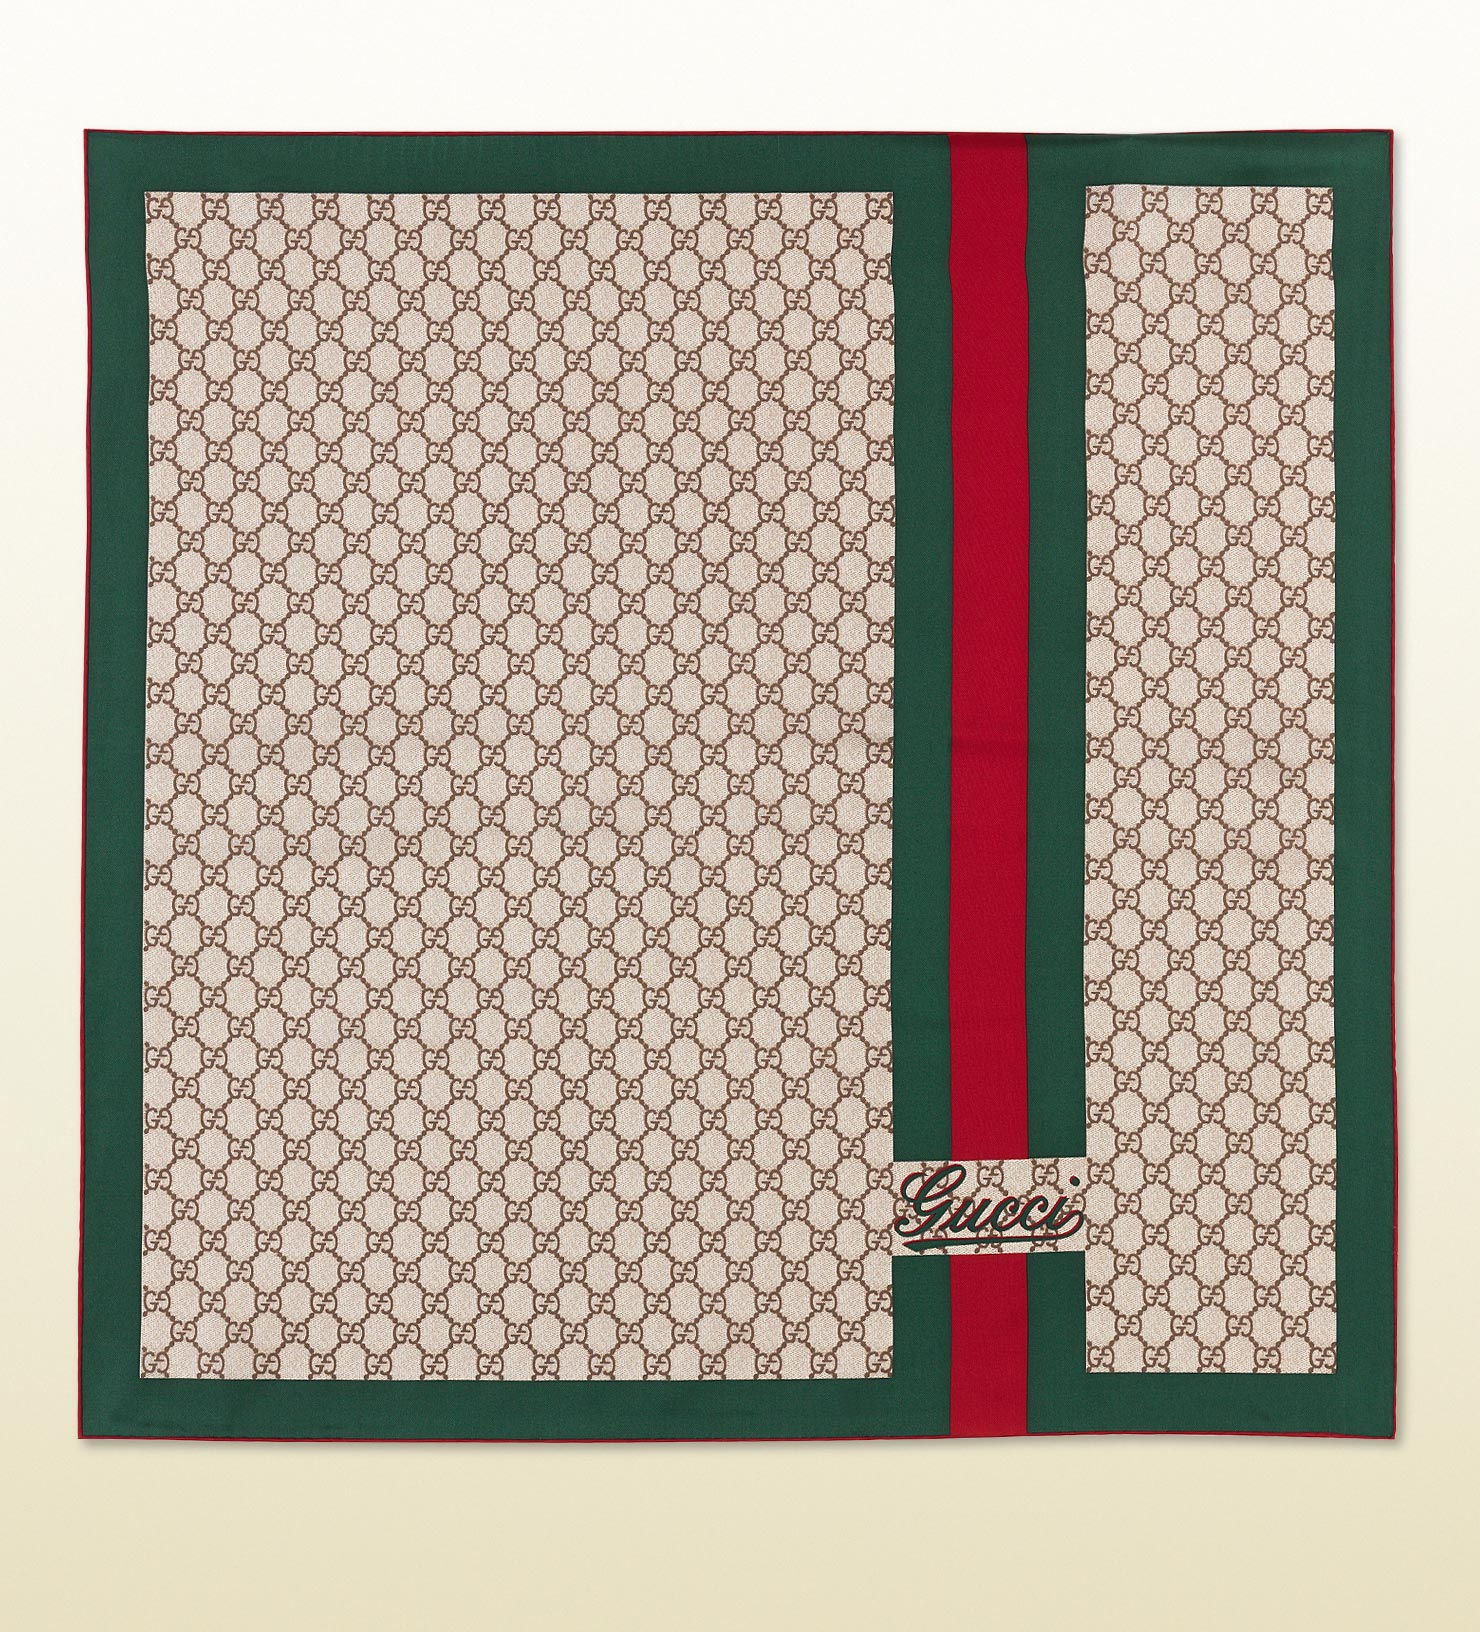 a06767d8b15 Gallery Gucci Blanket Fake. Gucci Blanket Fake Crochet Ideas 2019 ...